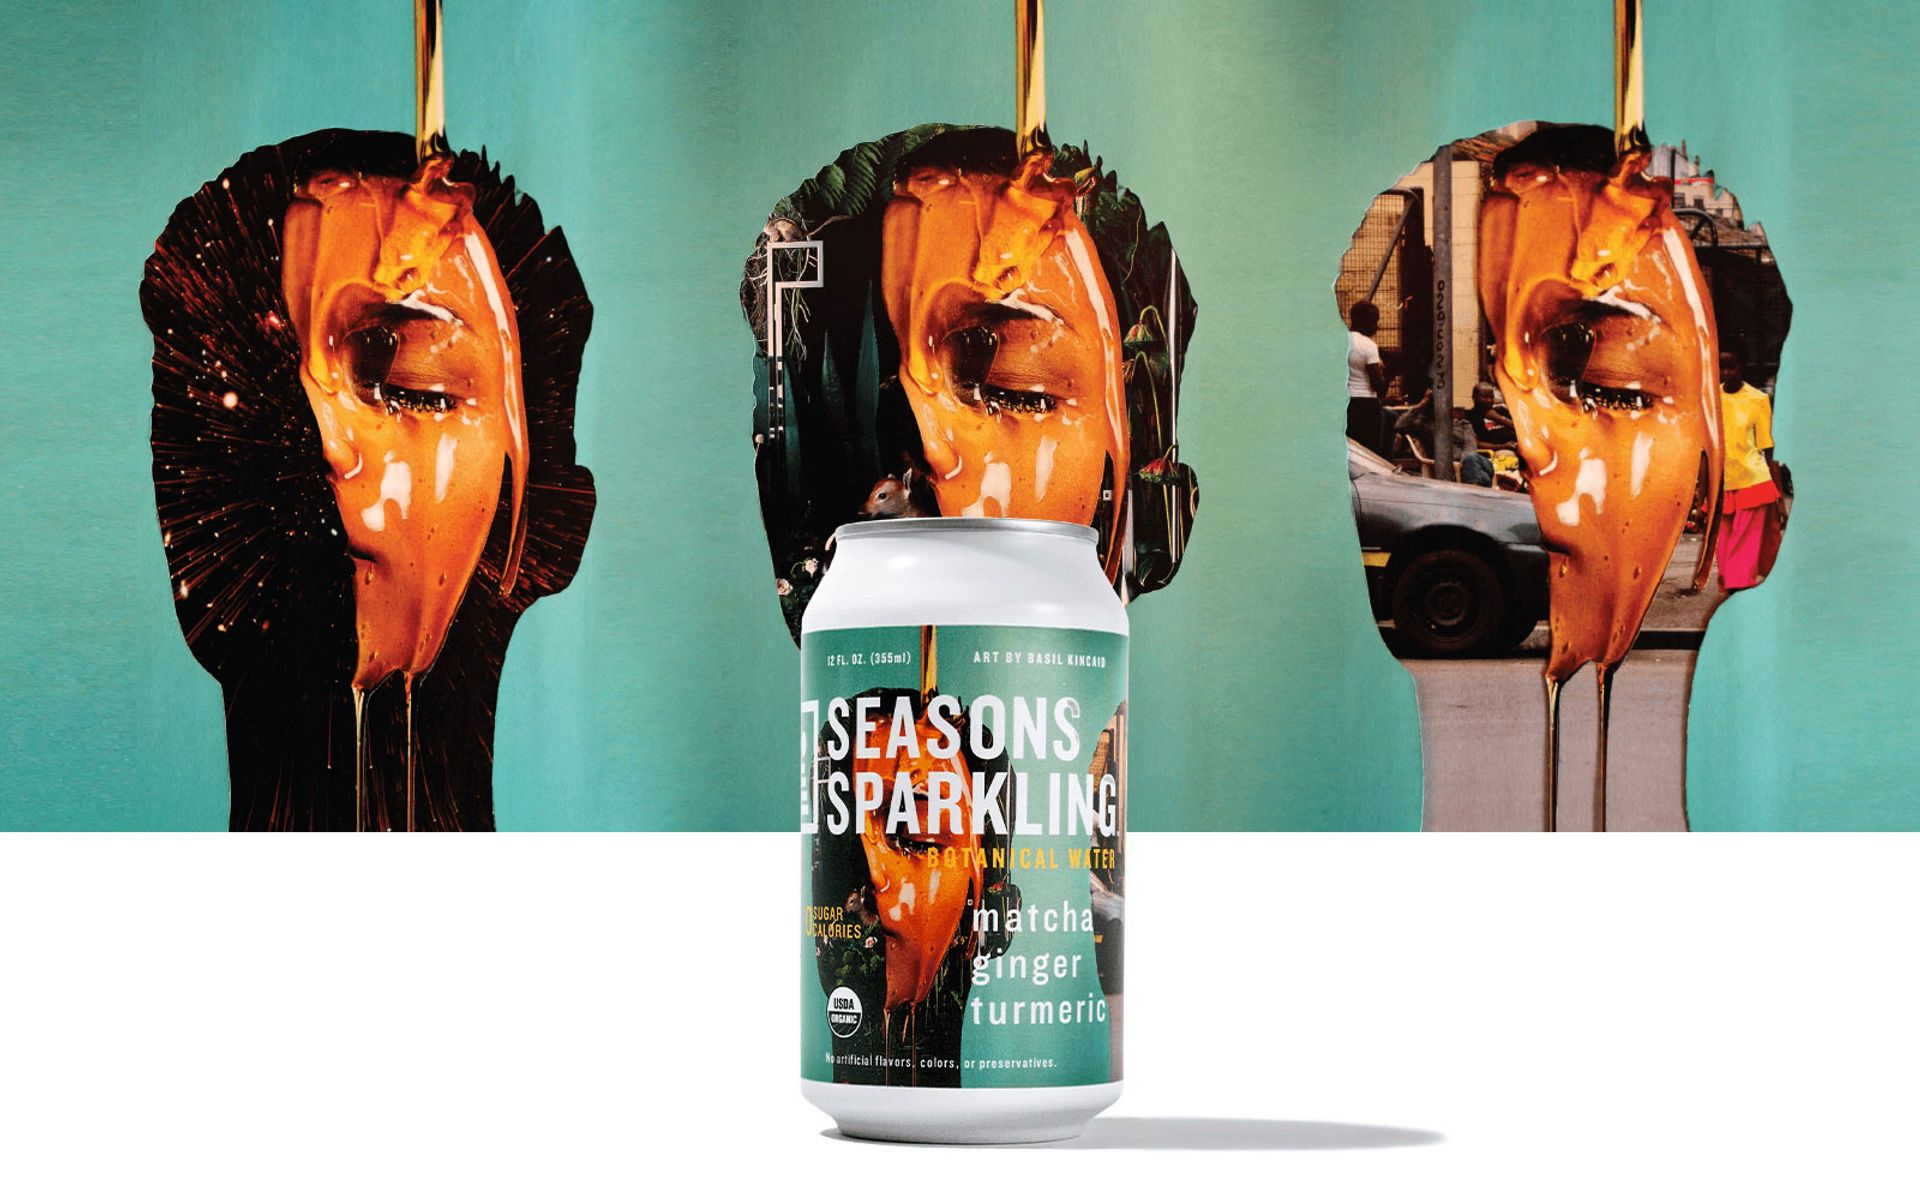 Sparkling stuff: Seasons Sparkling with art work by Basil Kincaid © Seasons Sparkling